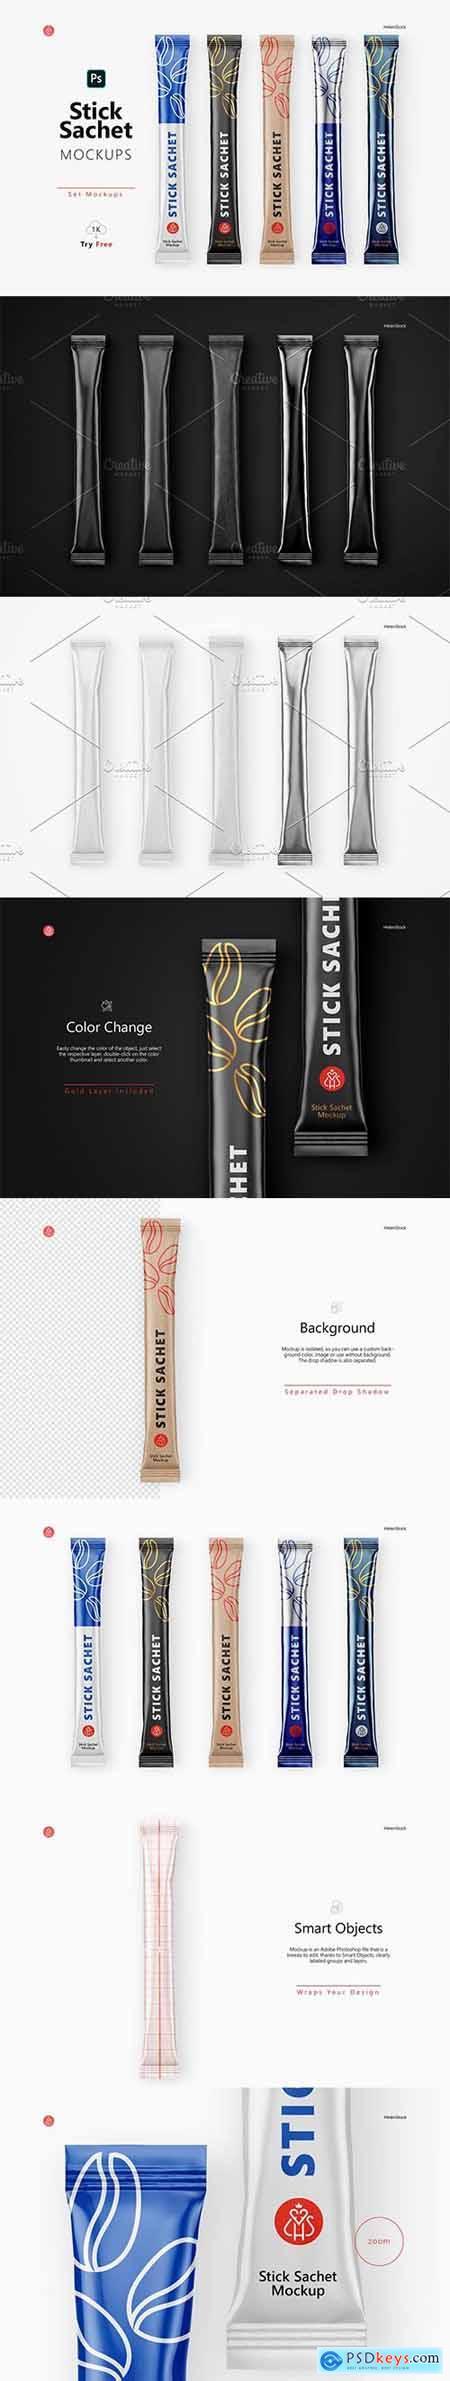 Creativemarket Stick Sachet Mockup - Top View 5734220